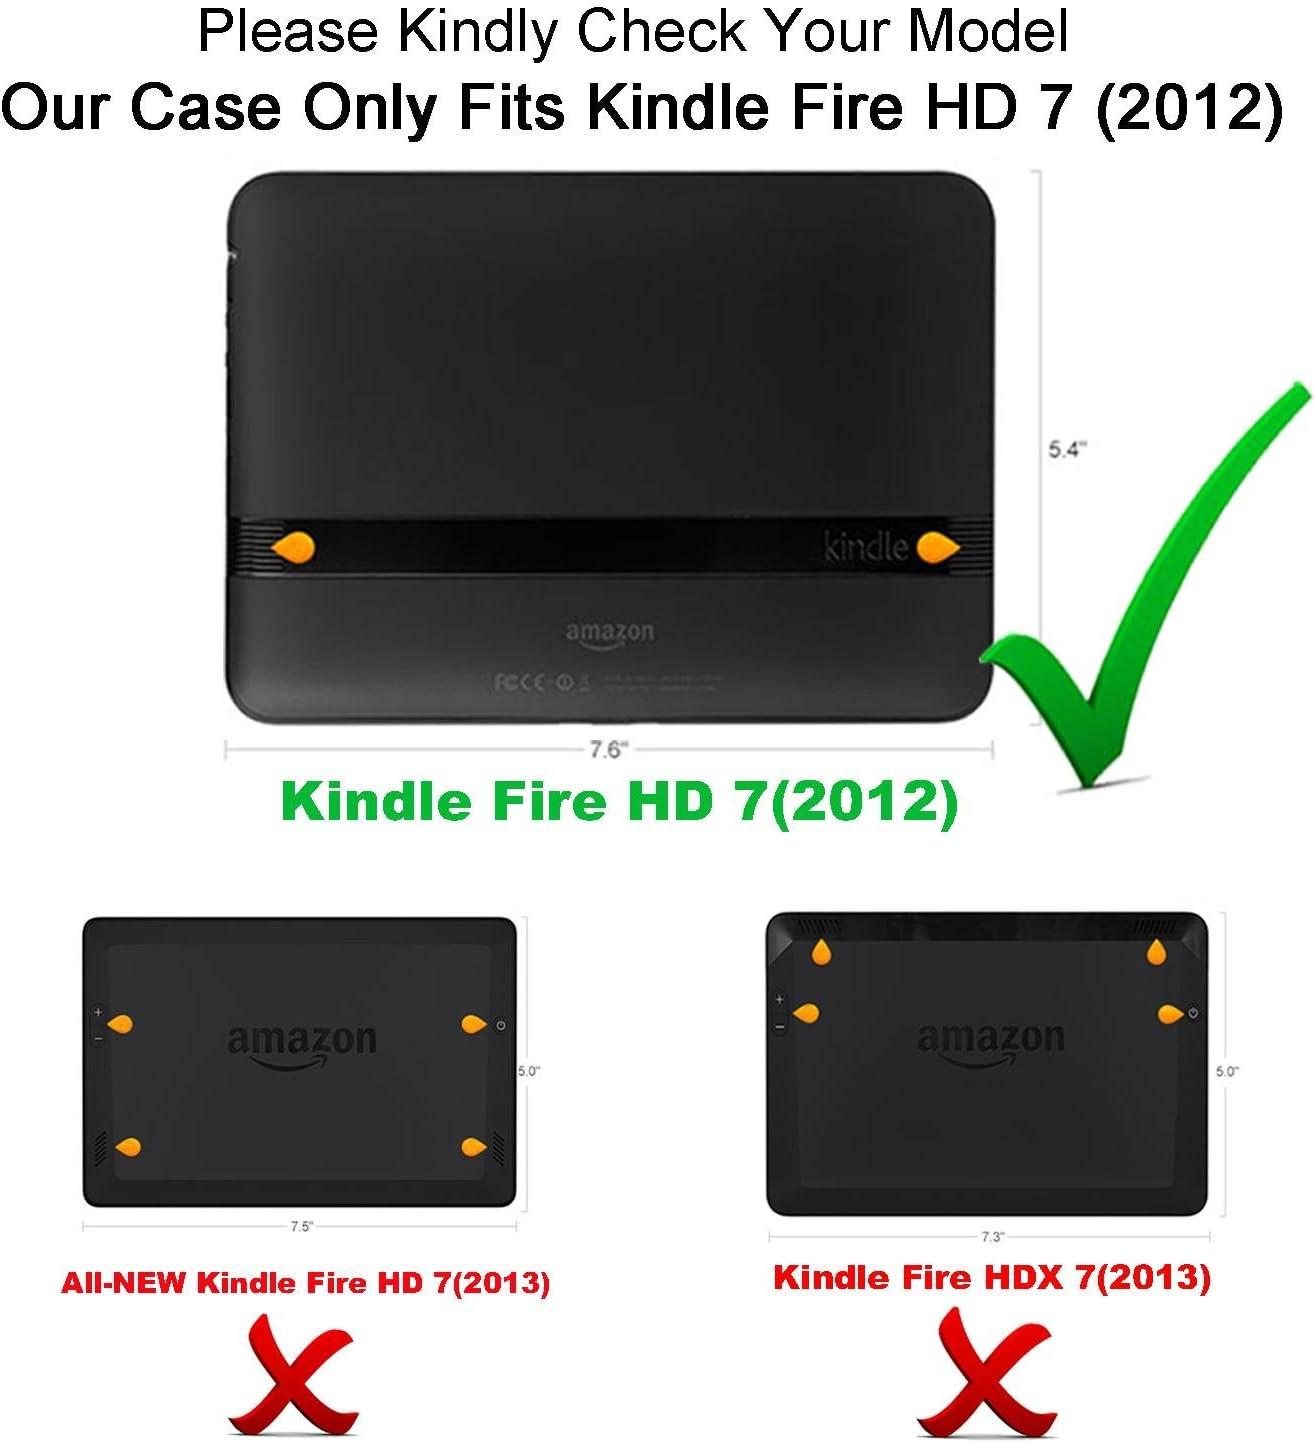 Amazon Com Acdream Kindle Fire Hd 7 2012 Version Case Amazon Kindle Fire Hd7 2012 Previous Model Case Pu Leather Cover Case For Kindle Fire Hd 7 2012 Version With Auto Sleep Wake